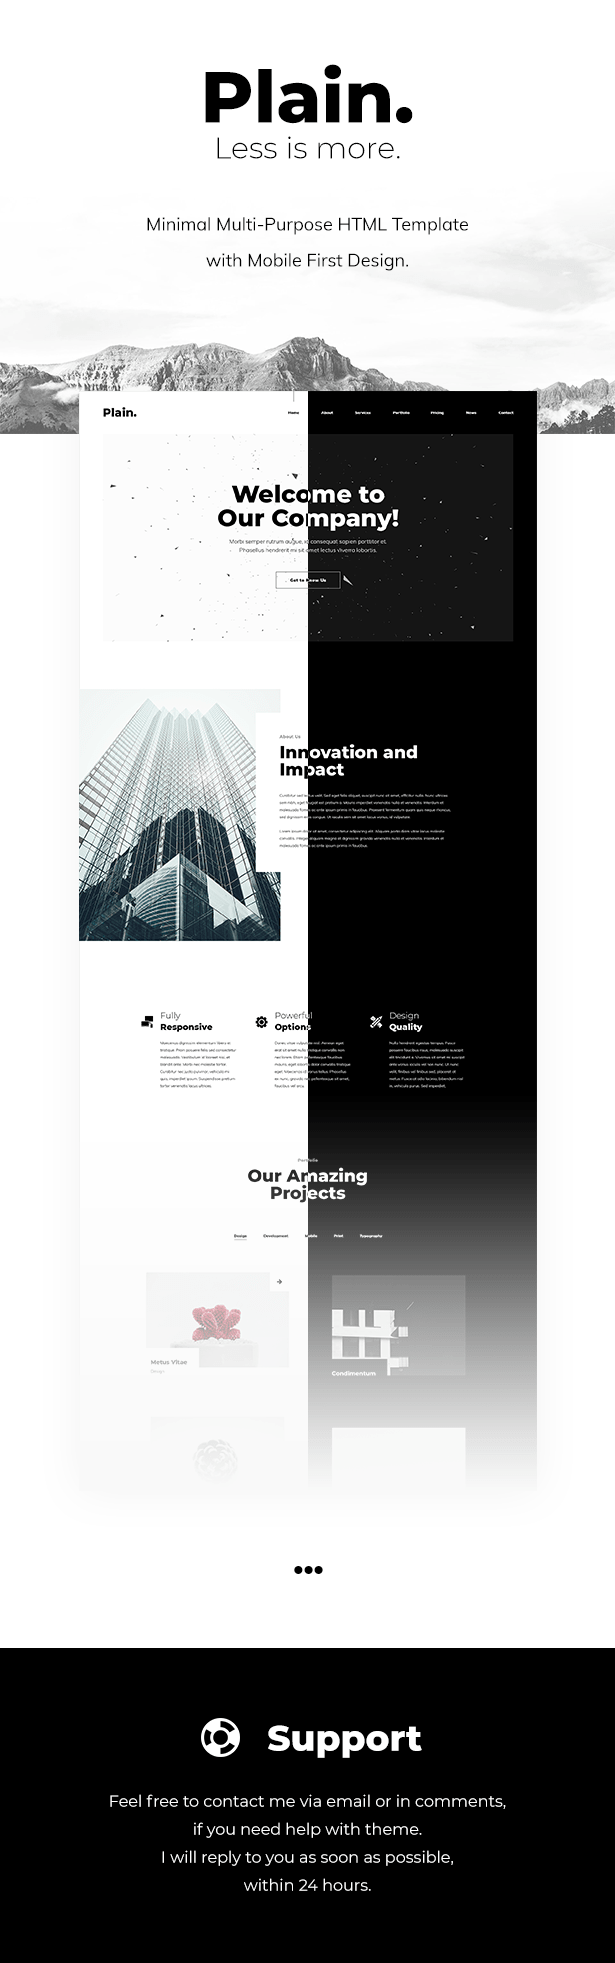 Plain - Minimal Multi-Purpose HTML Template